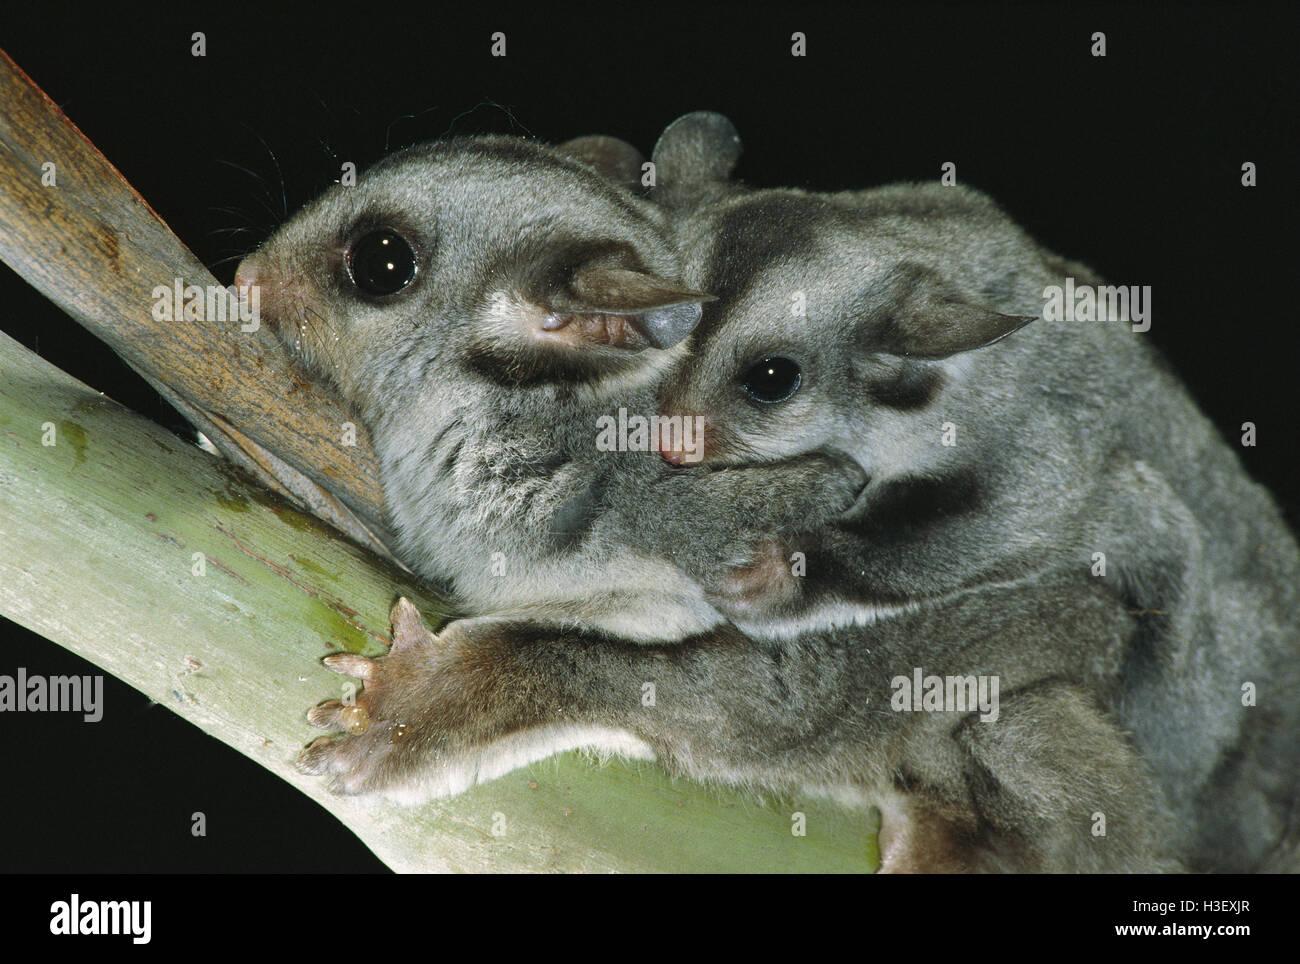 Sugar glider (Petaurus breviceps) - Stock Image